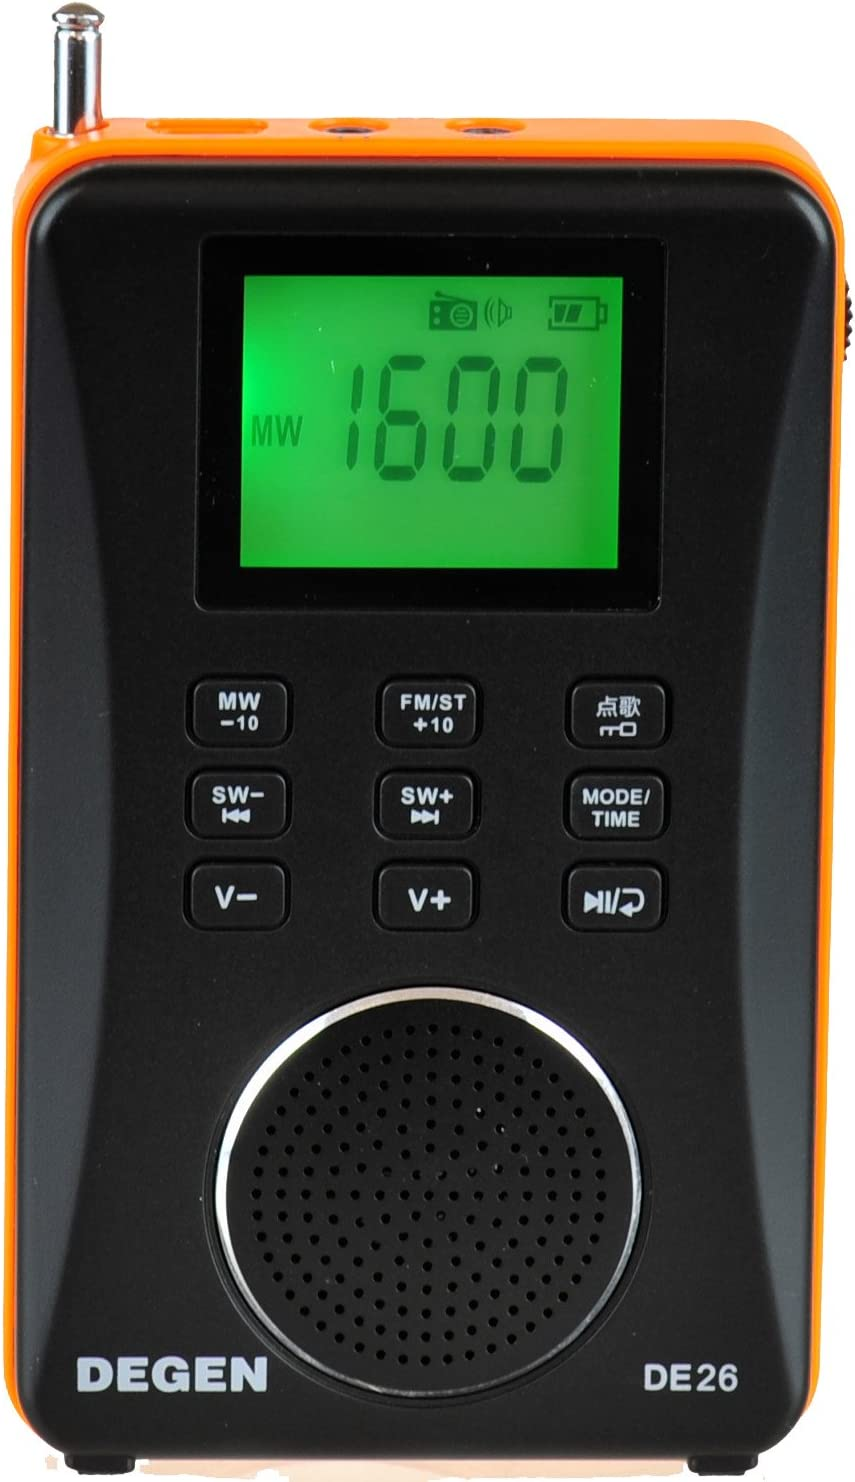 DEGEN Max 85% OFF DE26 3-in-1 Rechargeable AM S Shortwave FM Portable Direct stock discount Radio